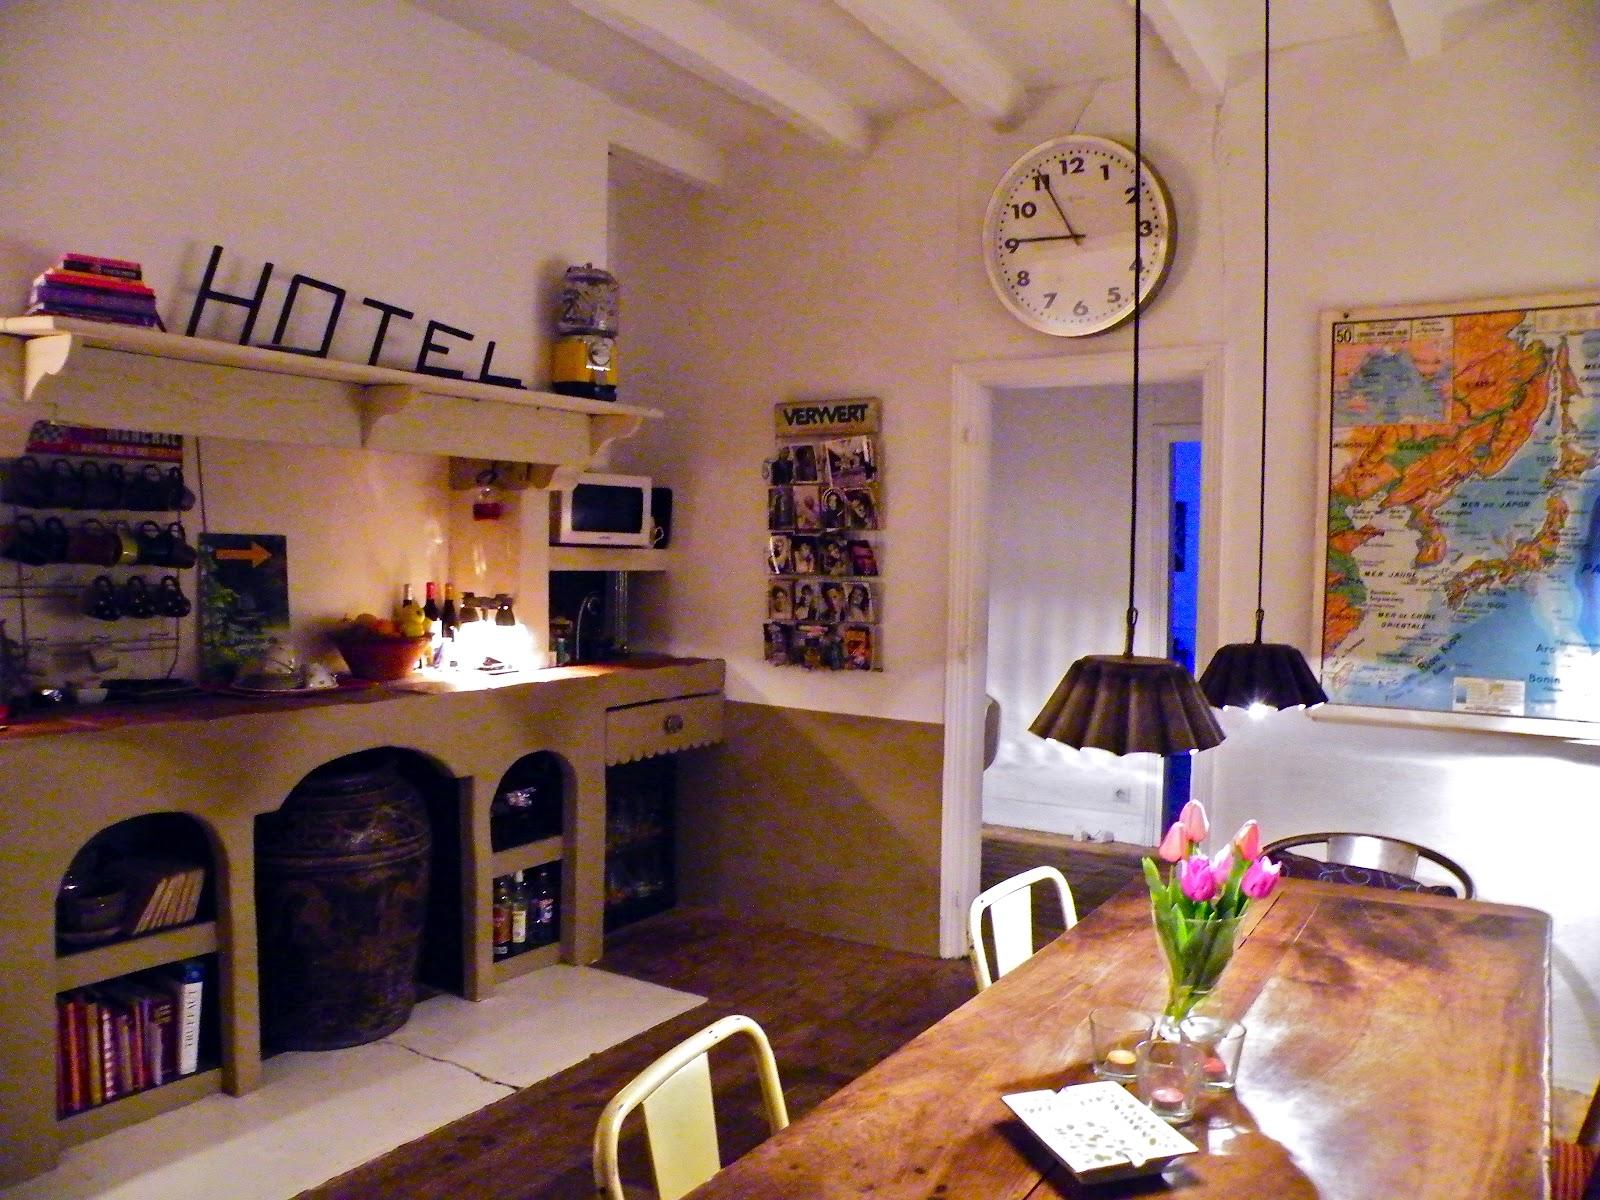 la maison de louna chambres d hotes design vintage. Black Bedroom Furniture Sets. Home Design Ideas